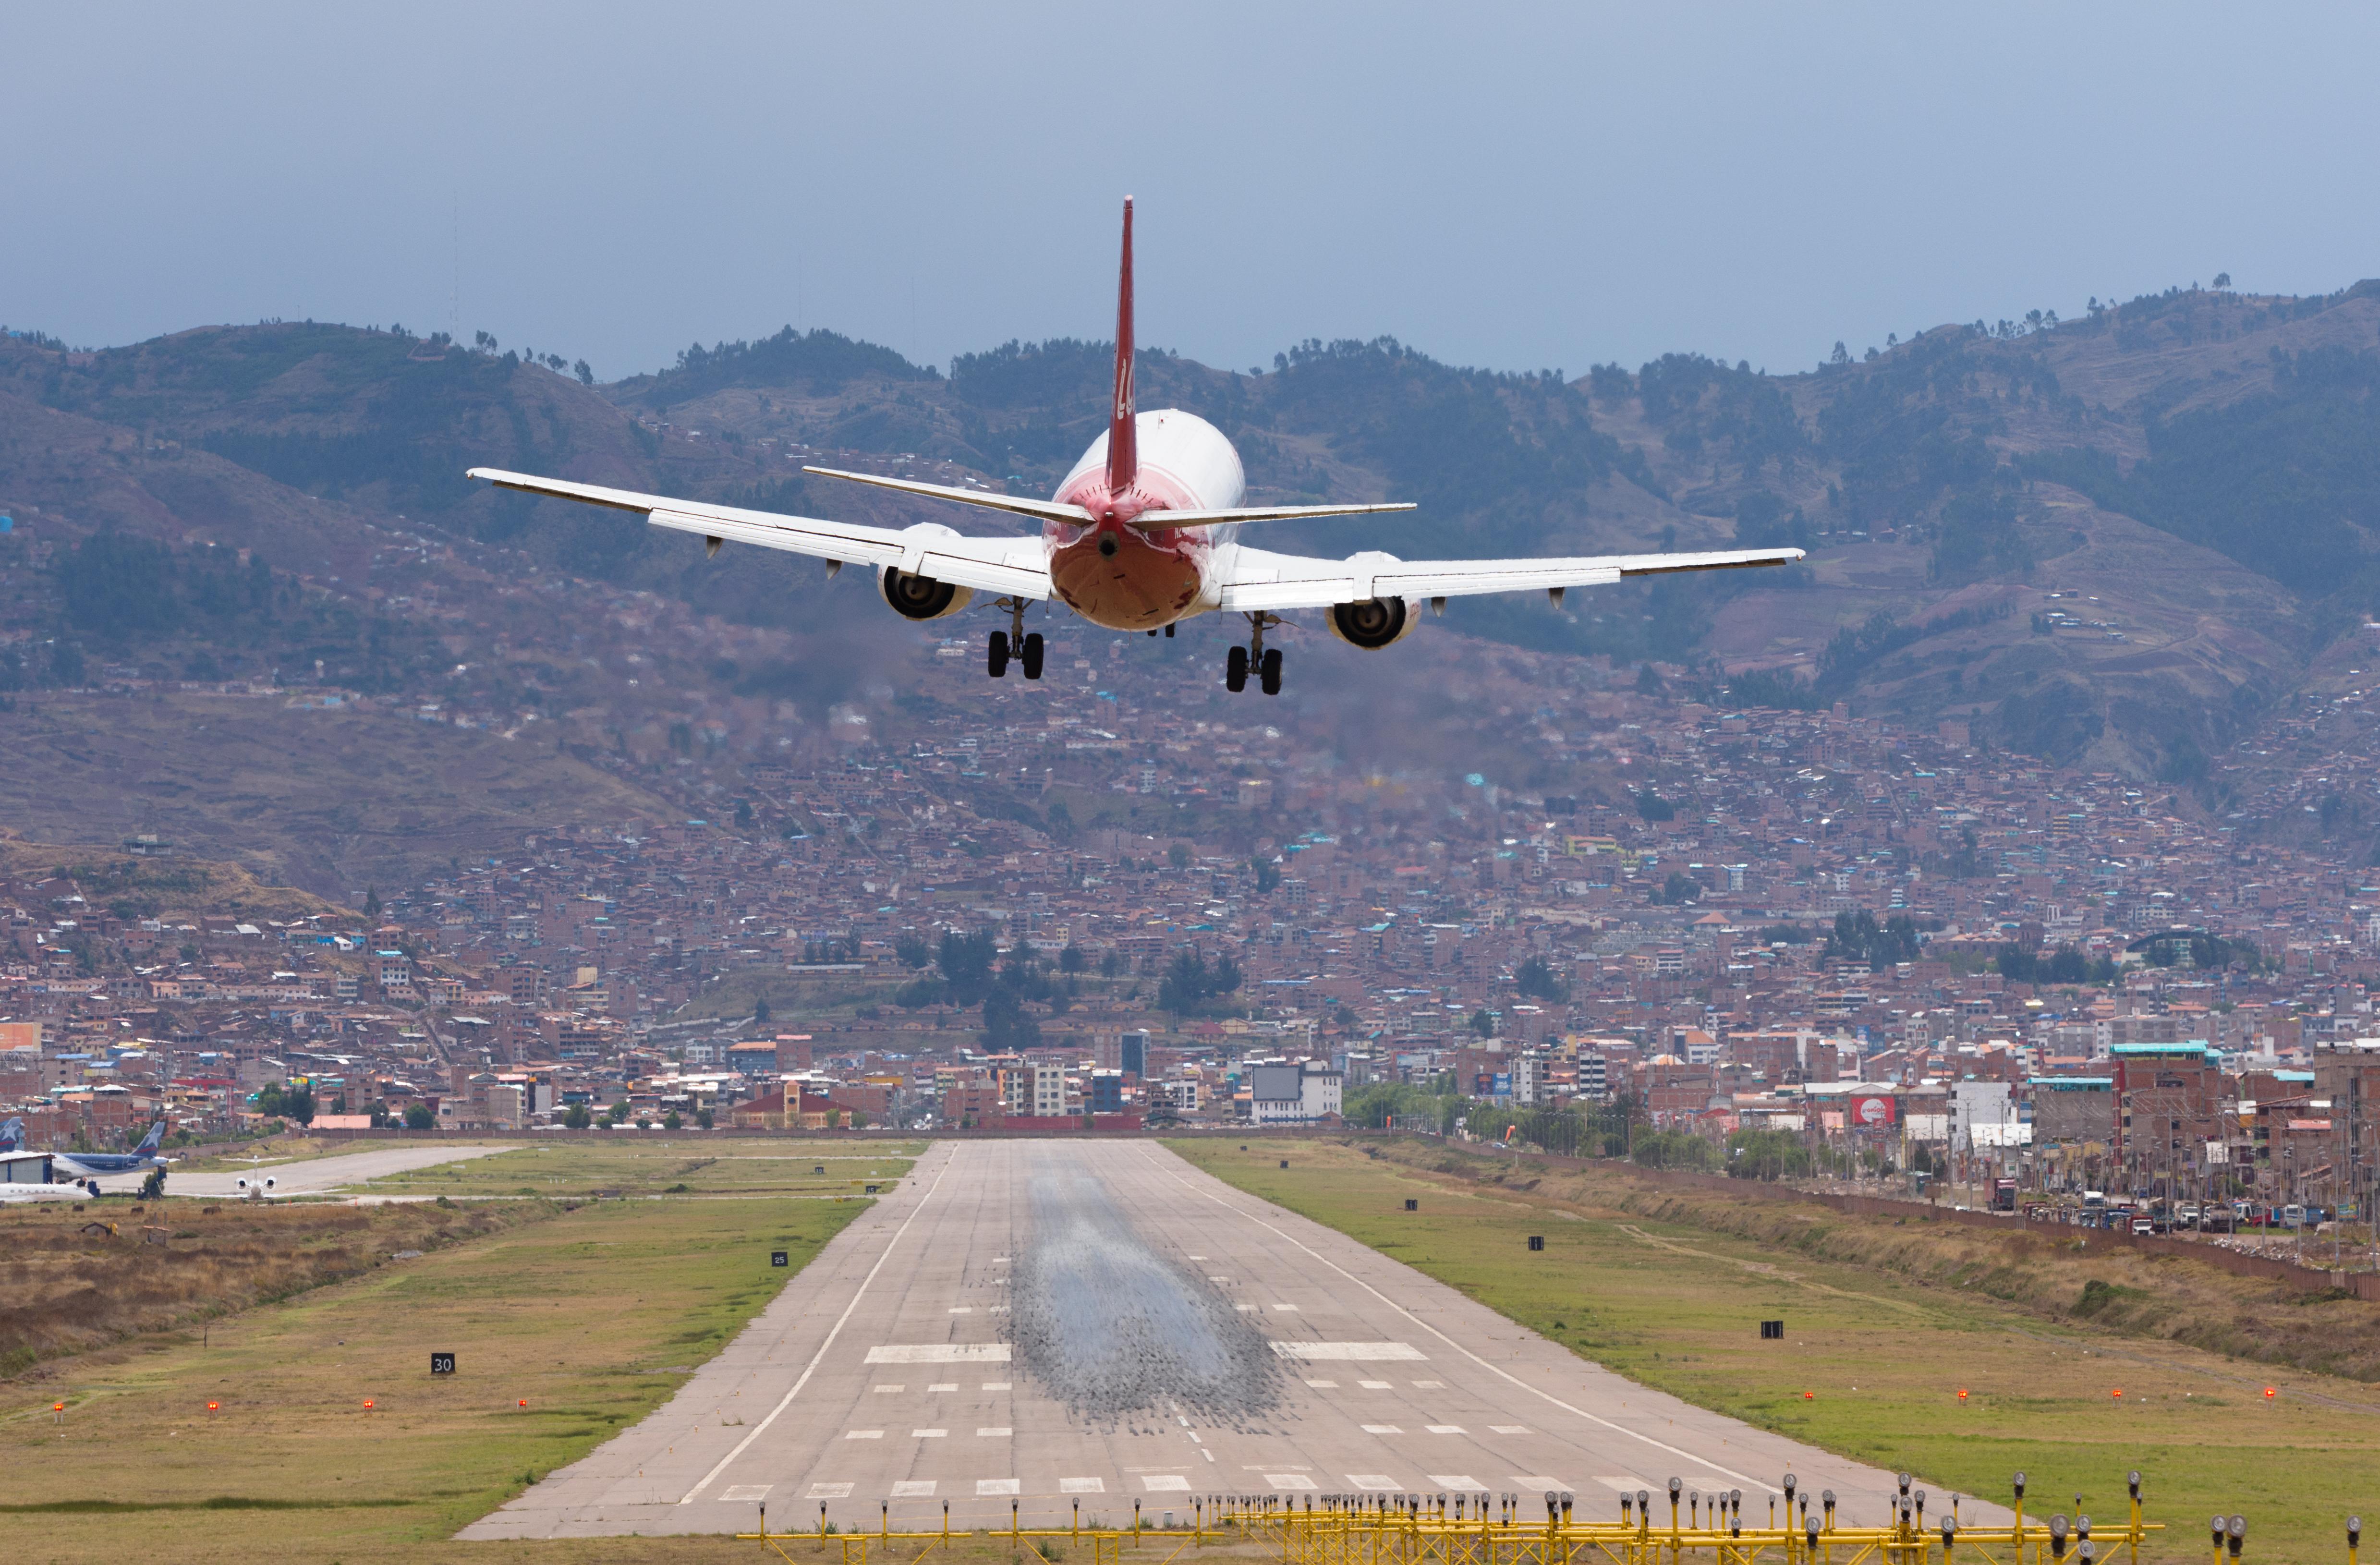 Archivo Aeropuerto Internacional Alejandro Velasco Astete Cusco Jpg Wikipedia La Enciclopedia Libre